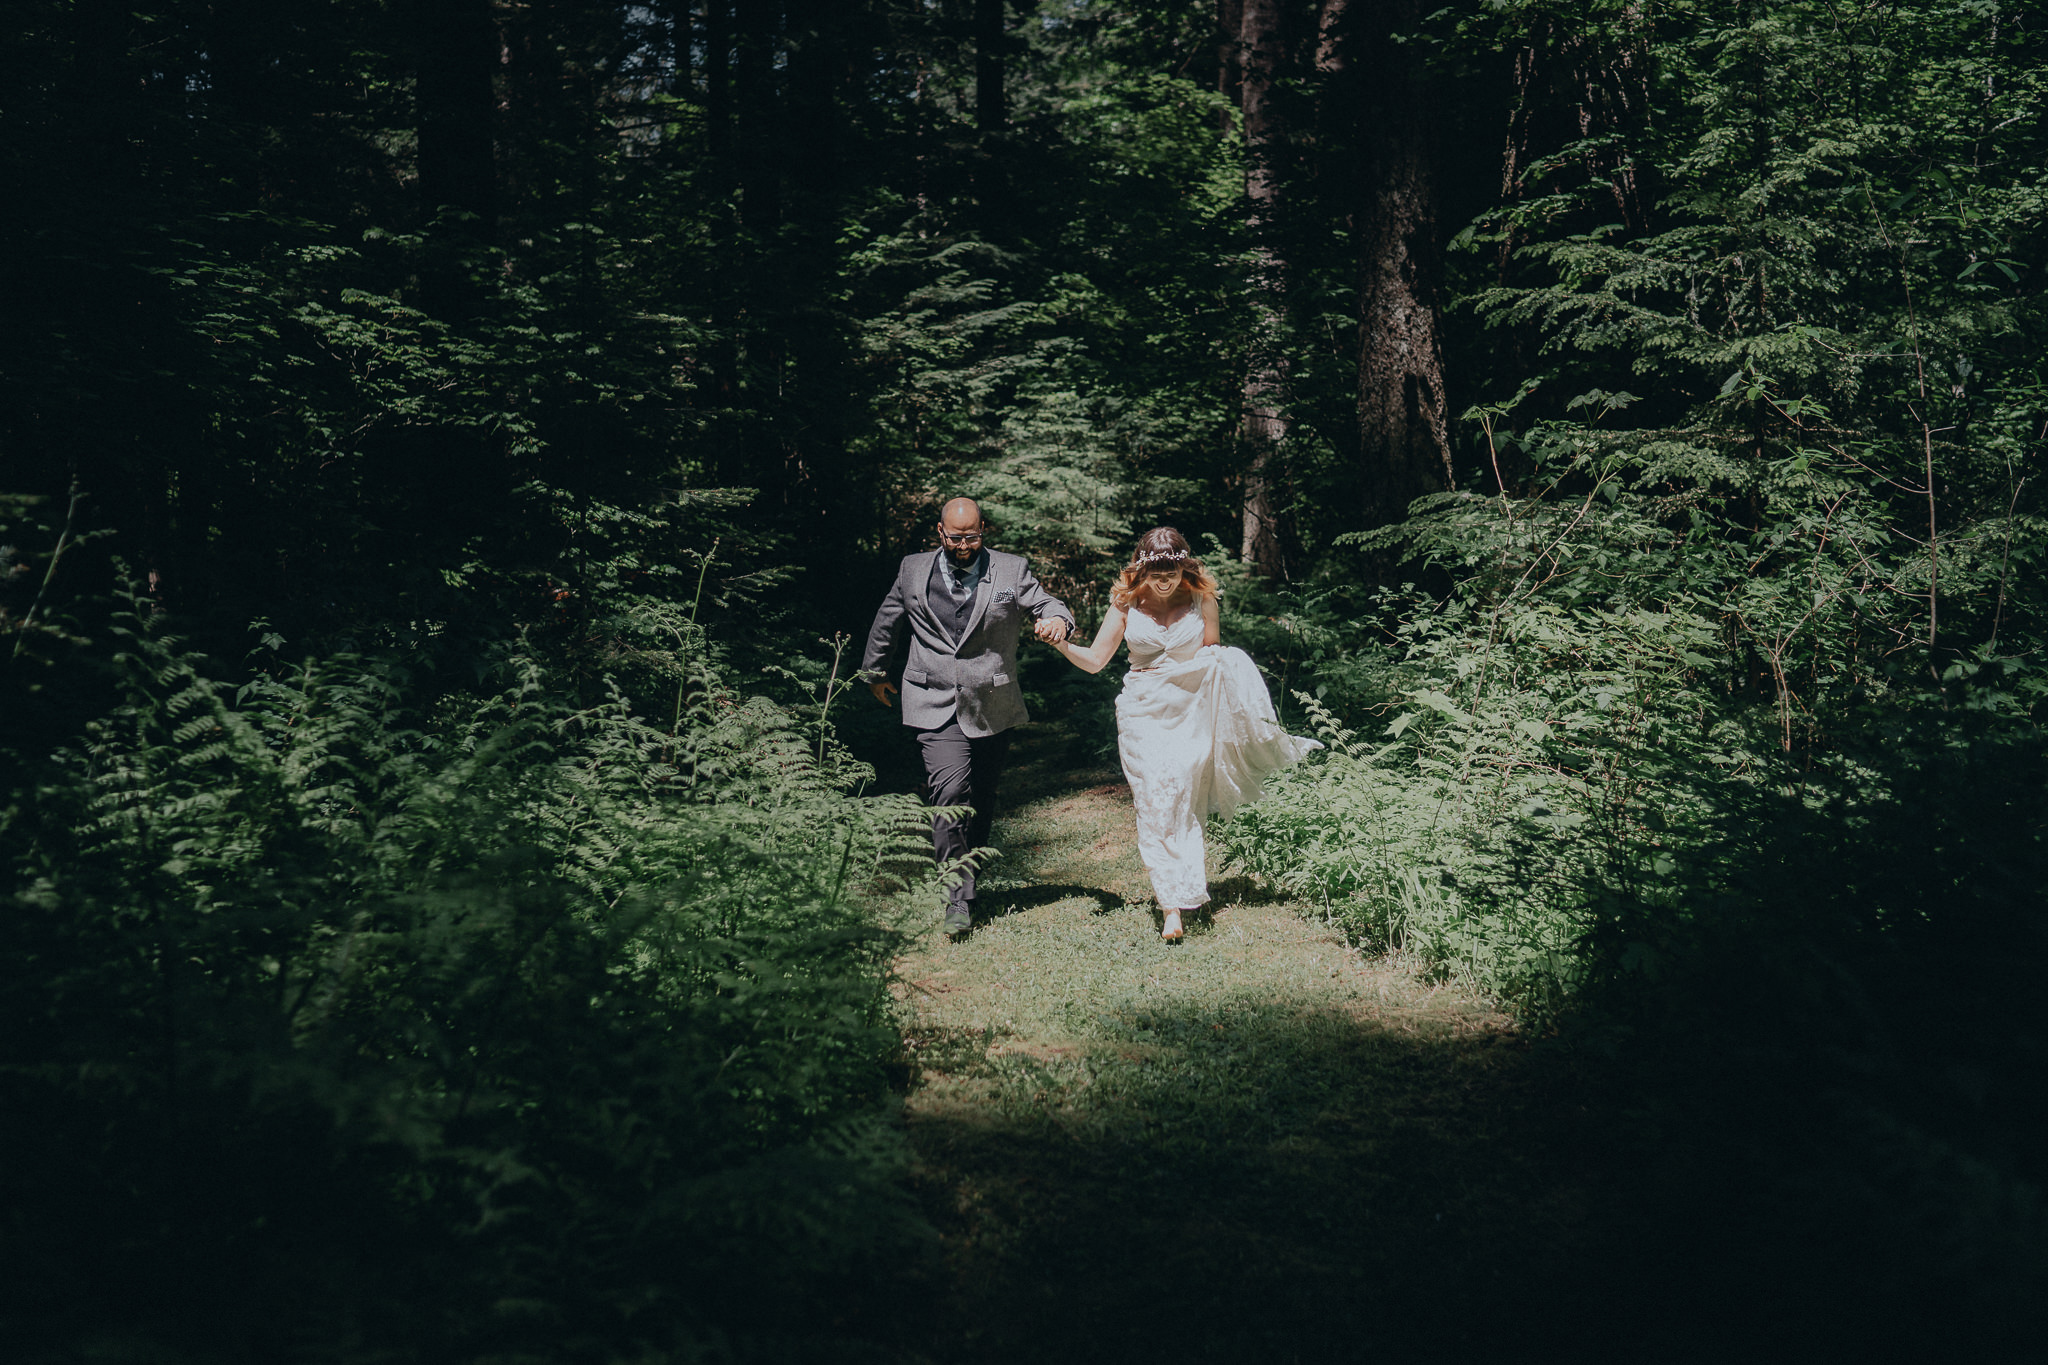 Skipping-woods-bride-groom-wedding-photography